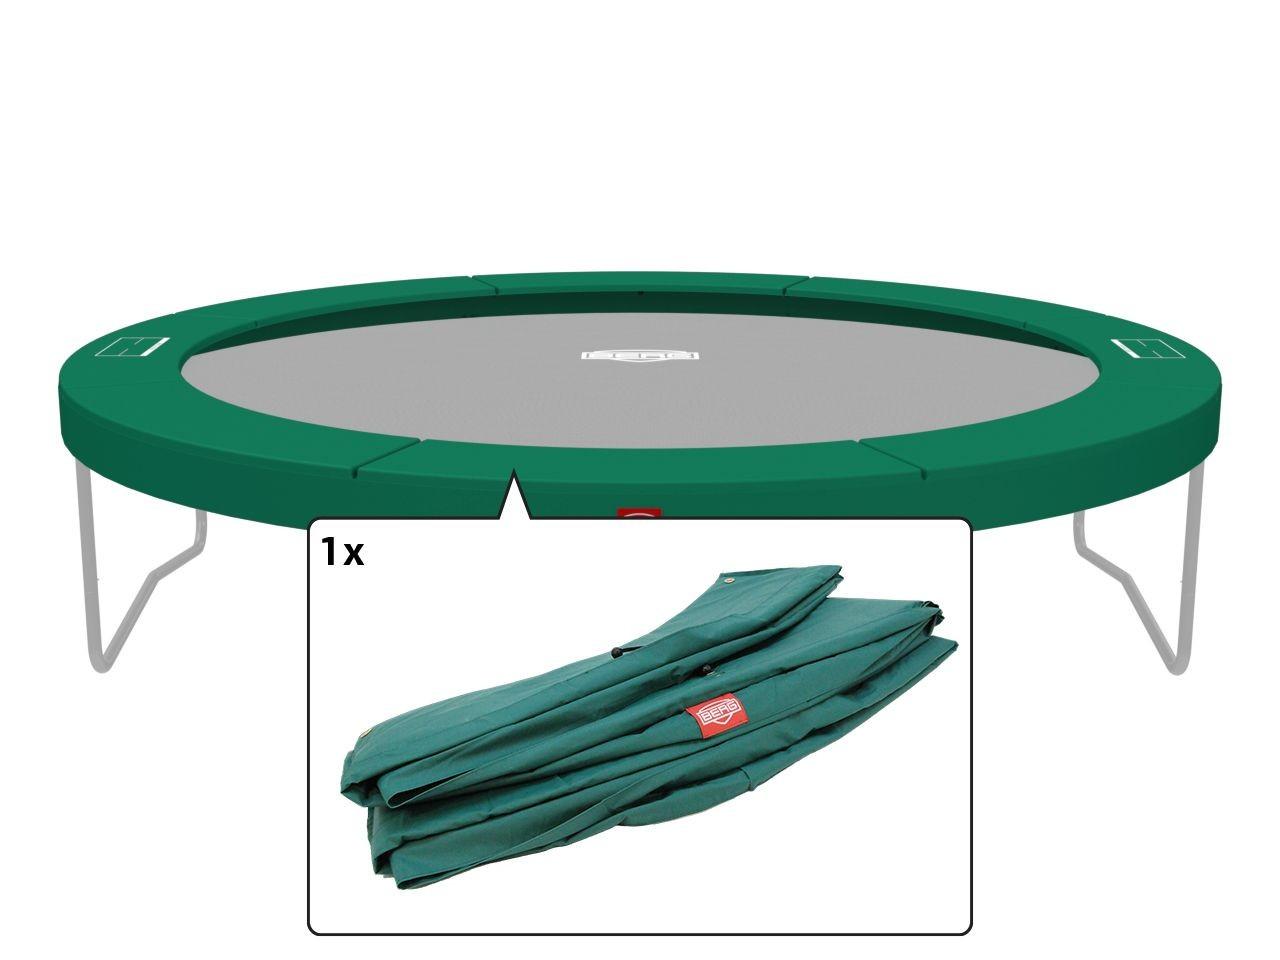 Champion - Padding green 330 (11ft)